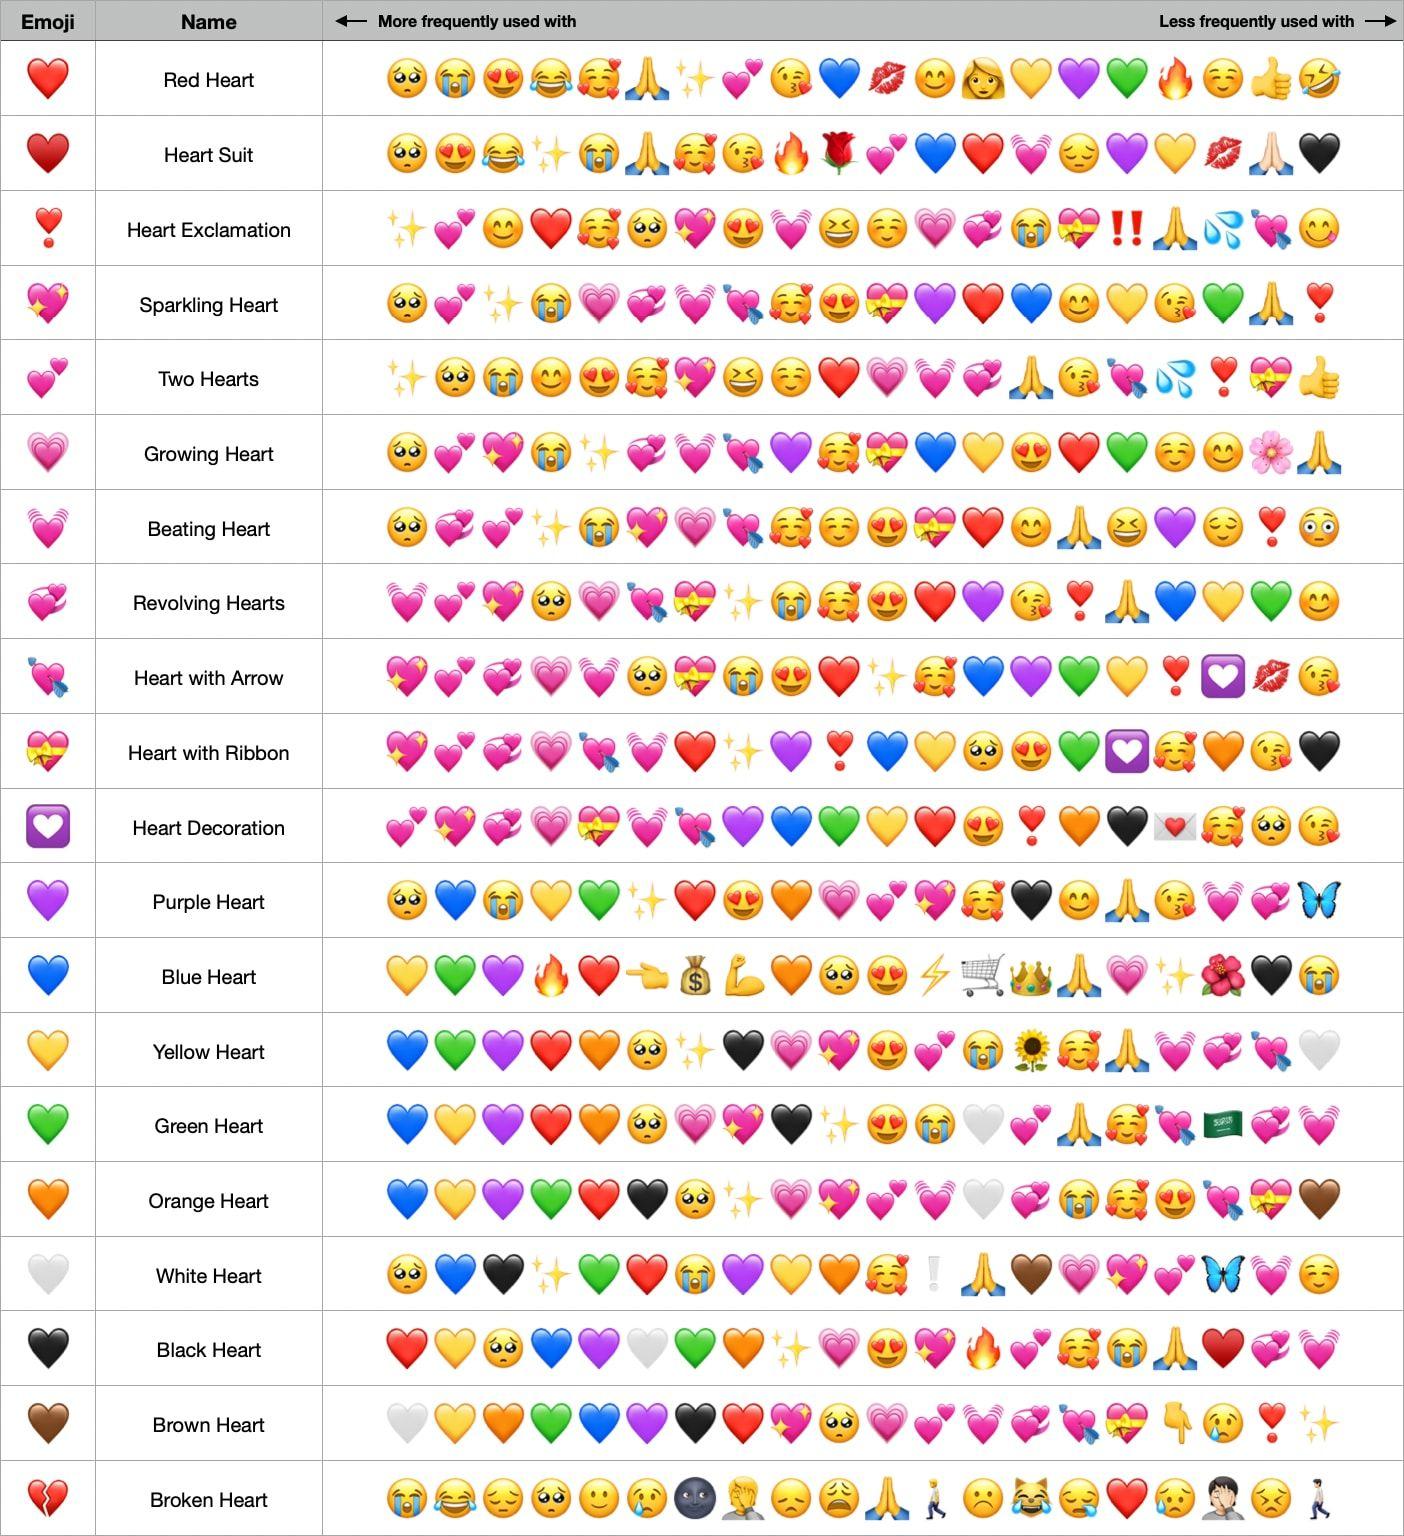 related-hearts-emojipedia-2021